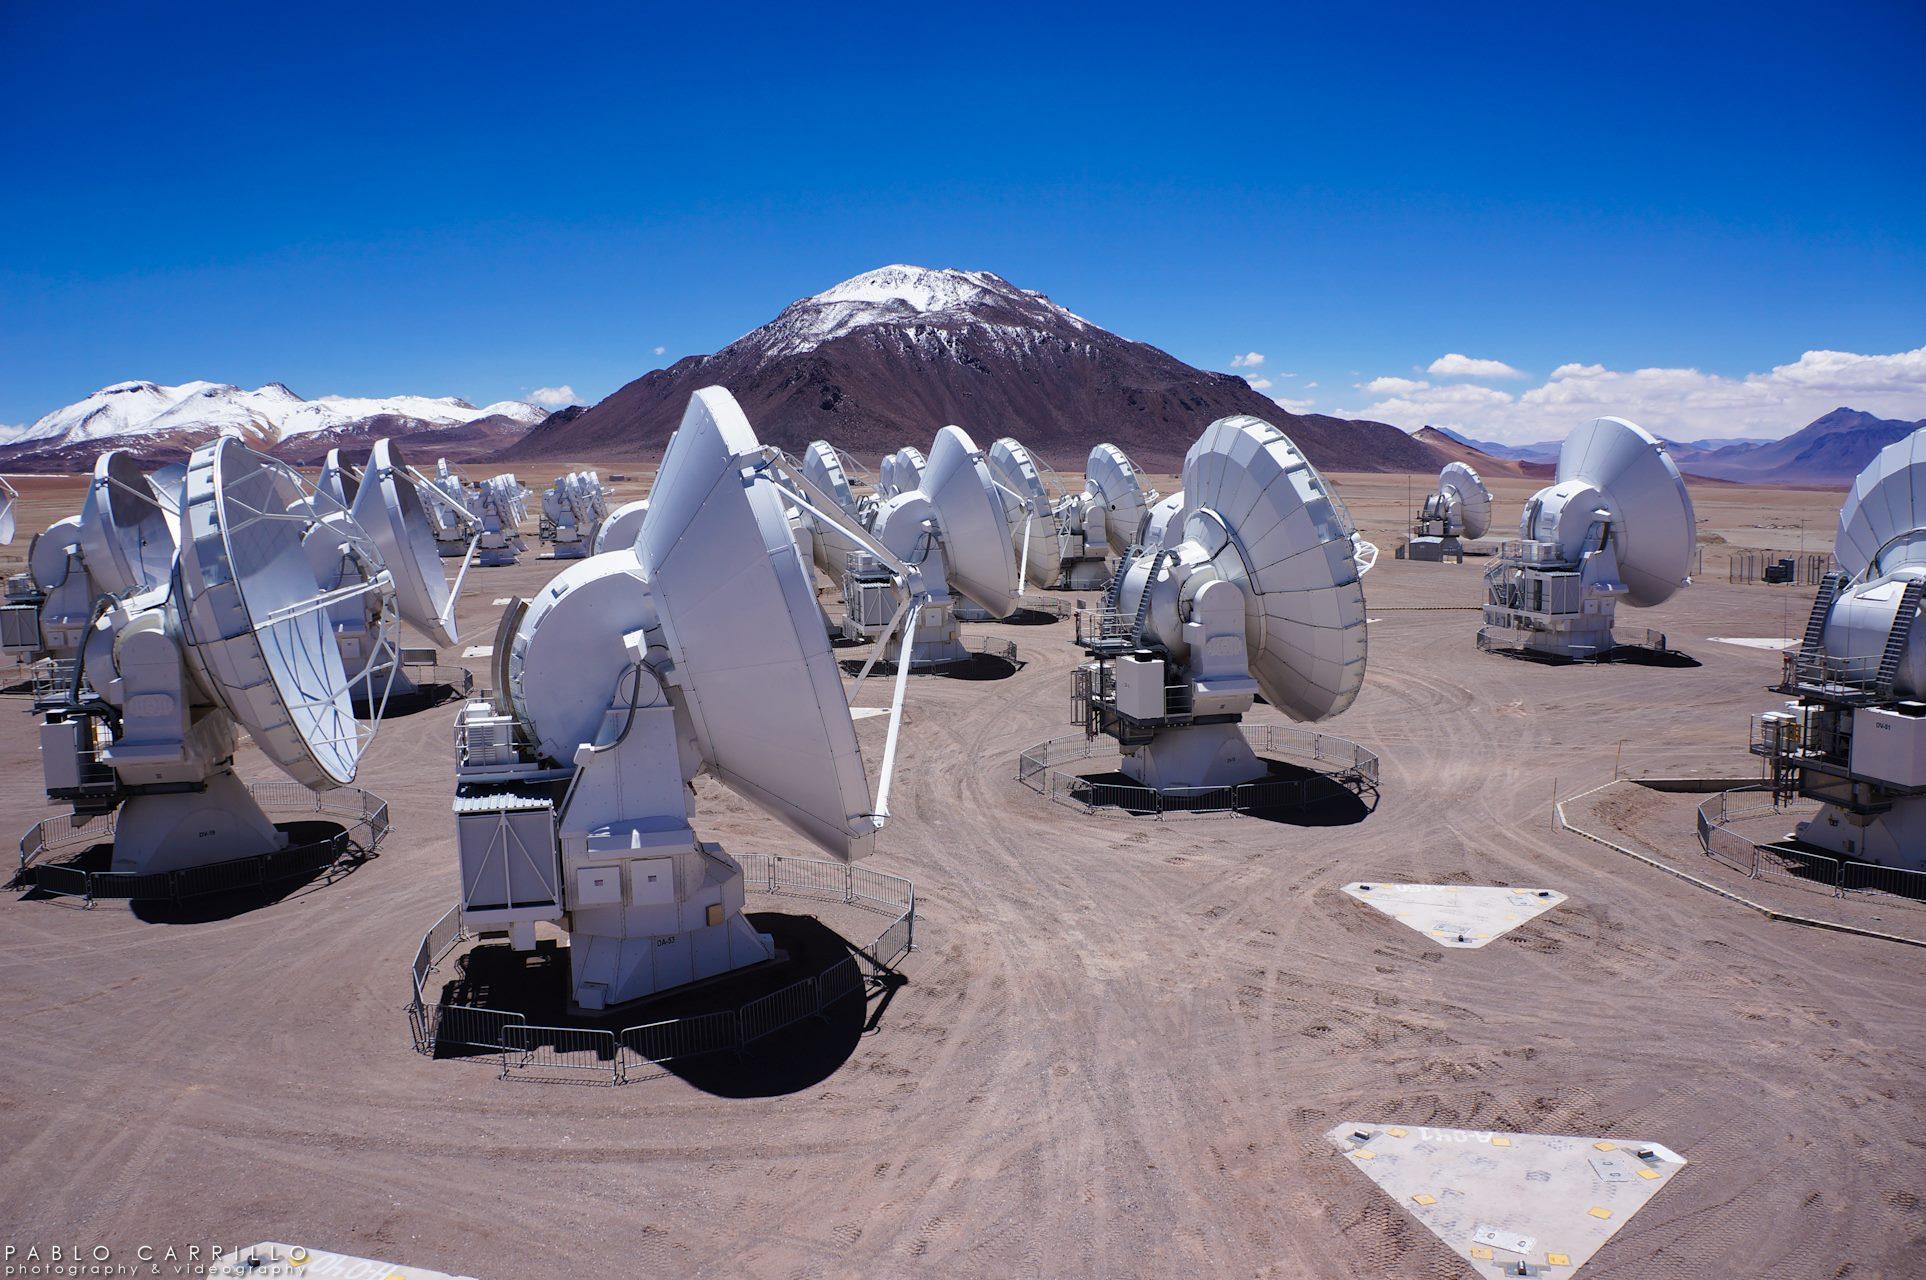 ALMA mayor telescopio del mundo